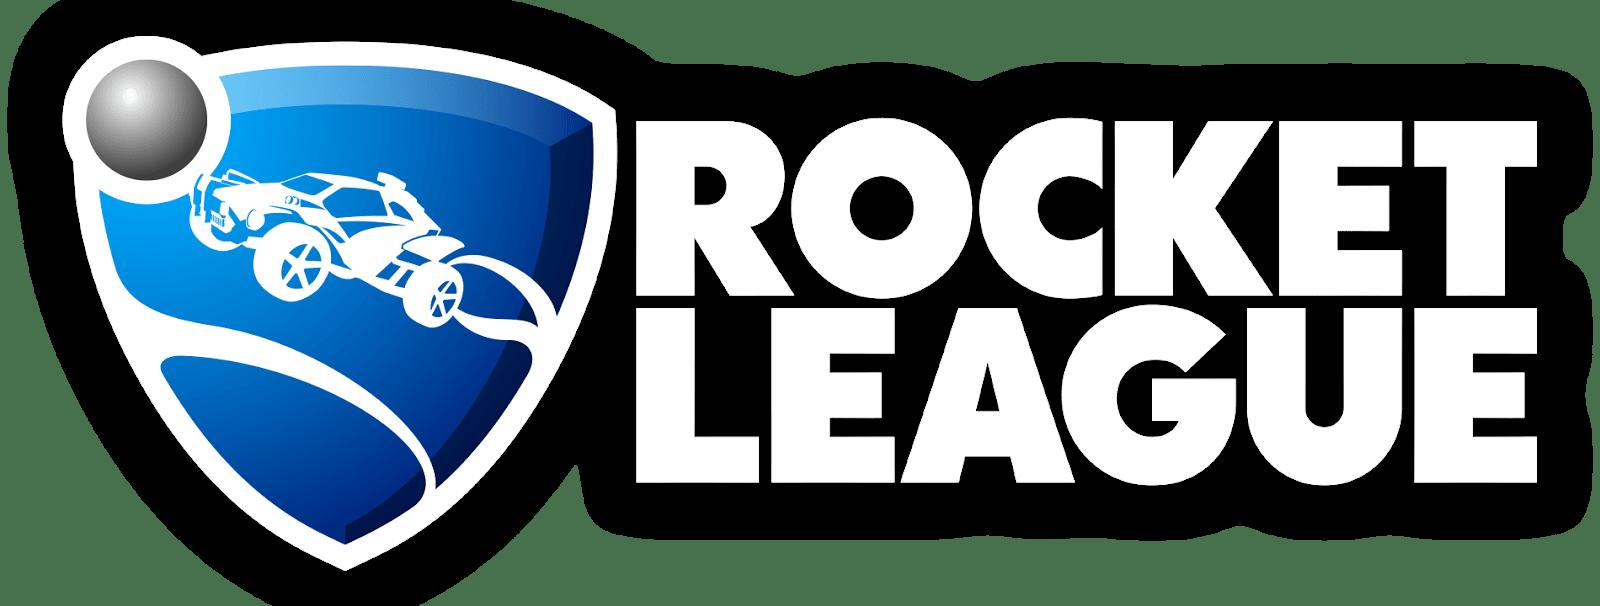 logo_rocket_league